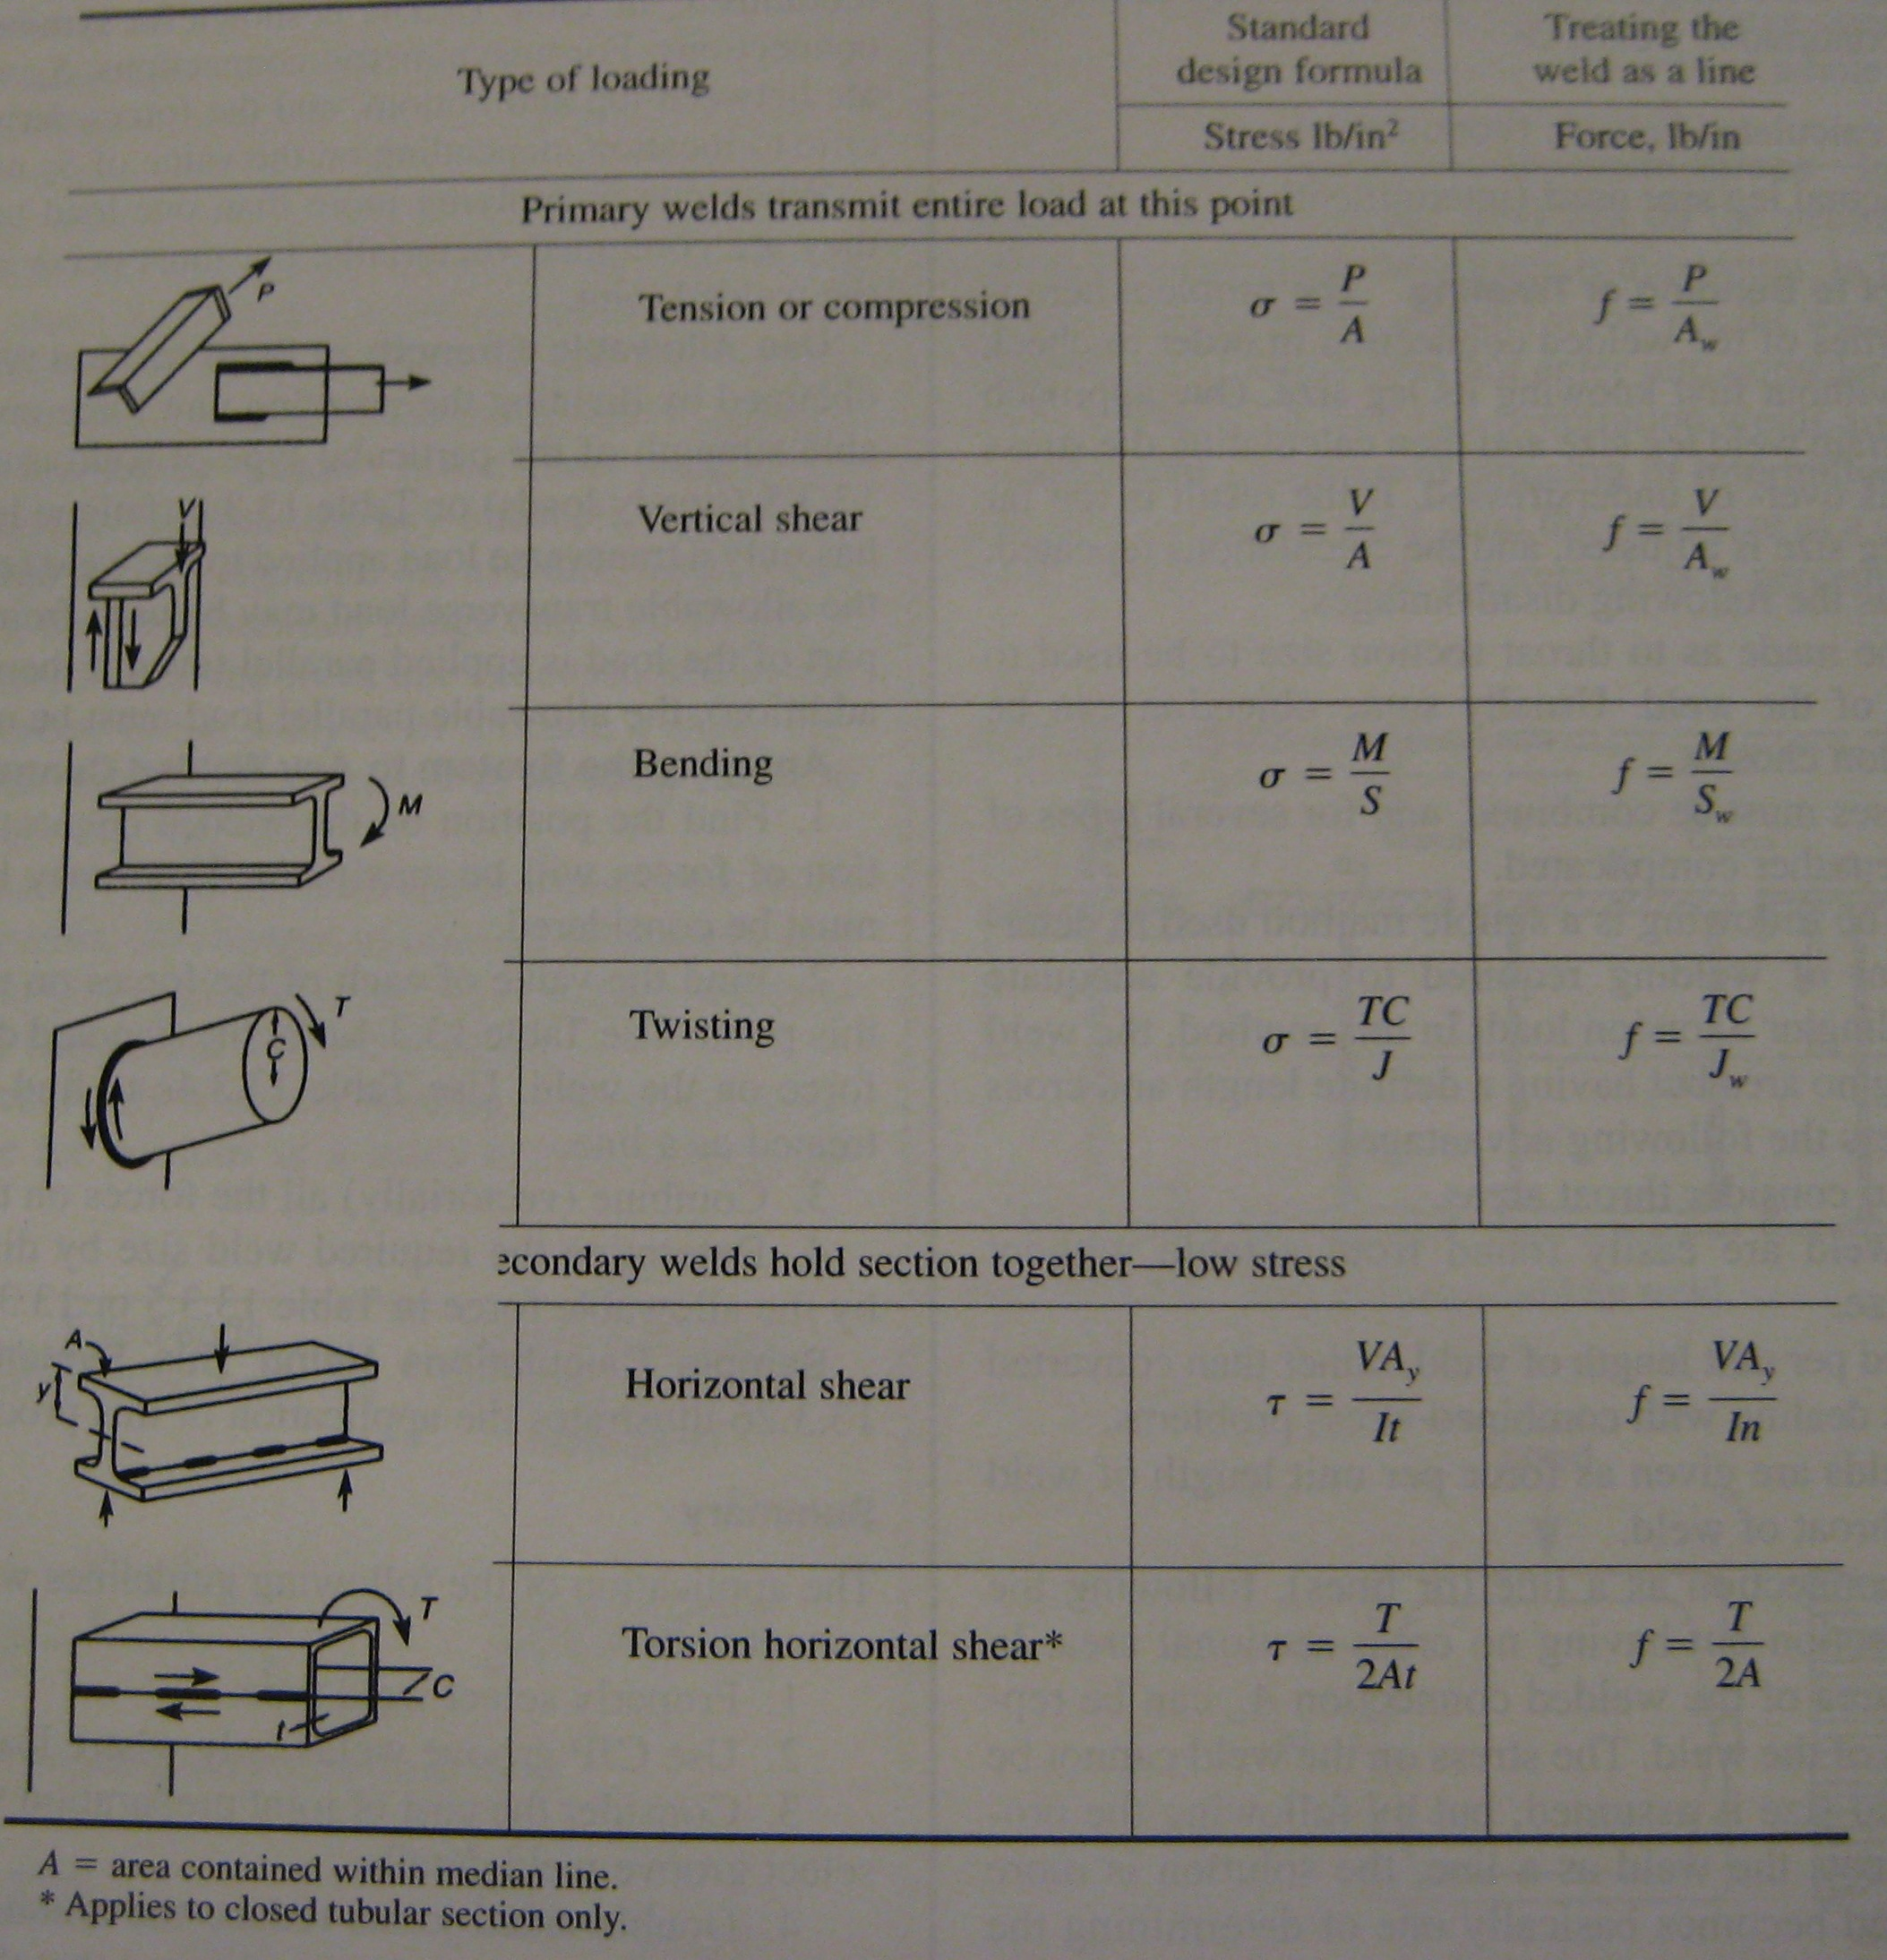 Welding | Valuable Mechanisms: The Design & Engineering Blog